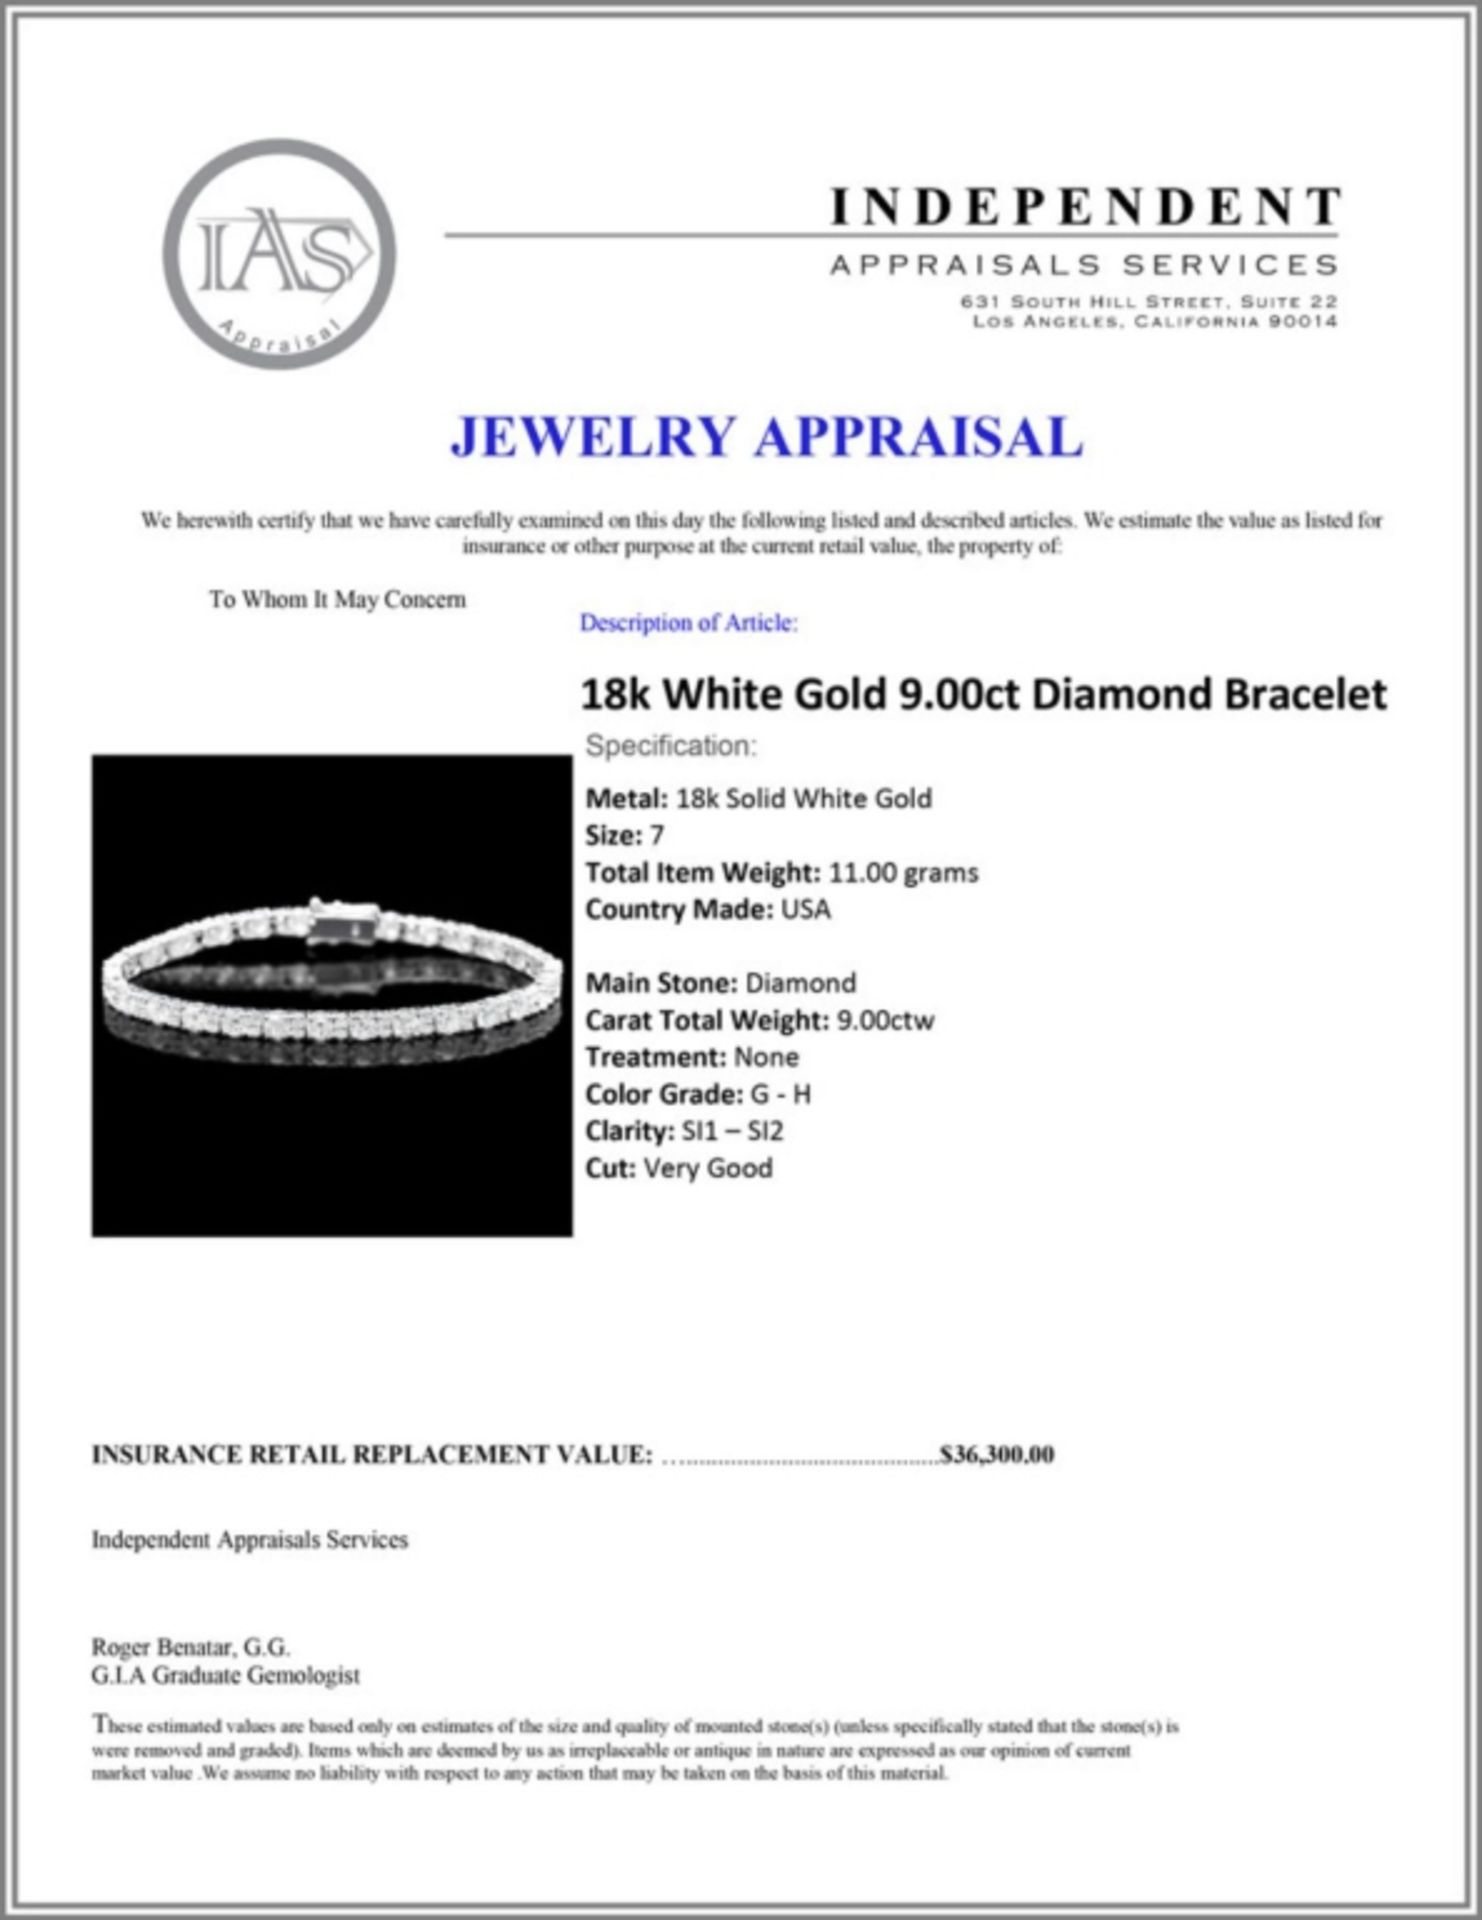 ^18k White Gold 9.00ct Diamond Bracelet - Image 4 of 4